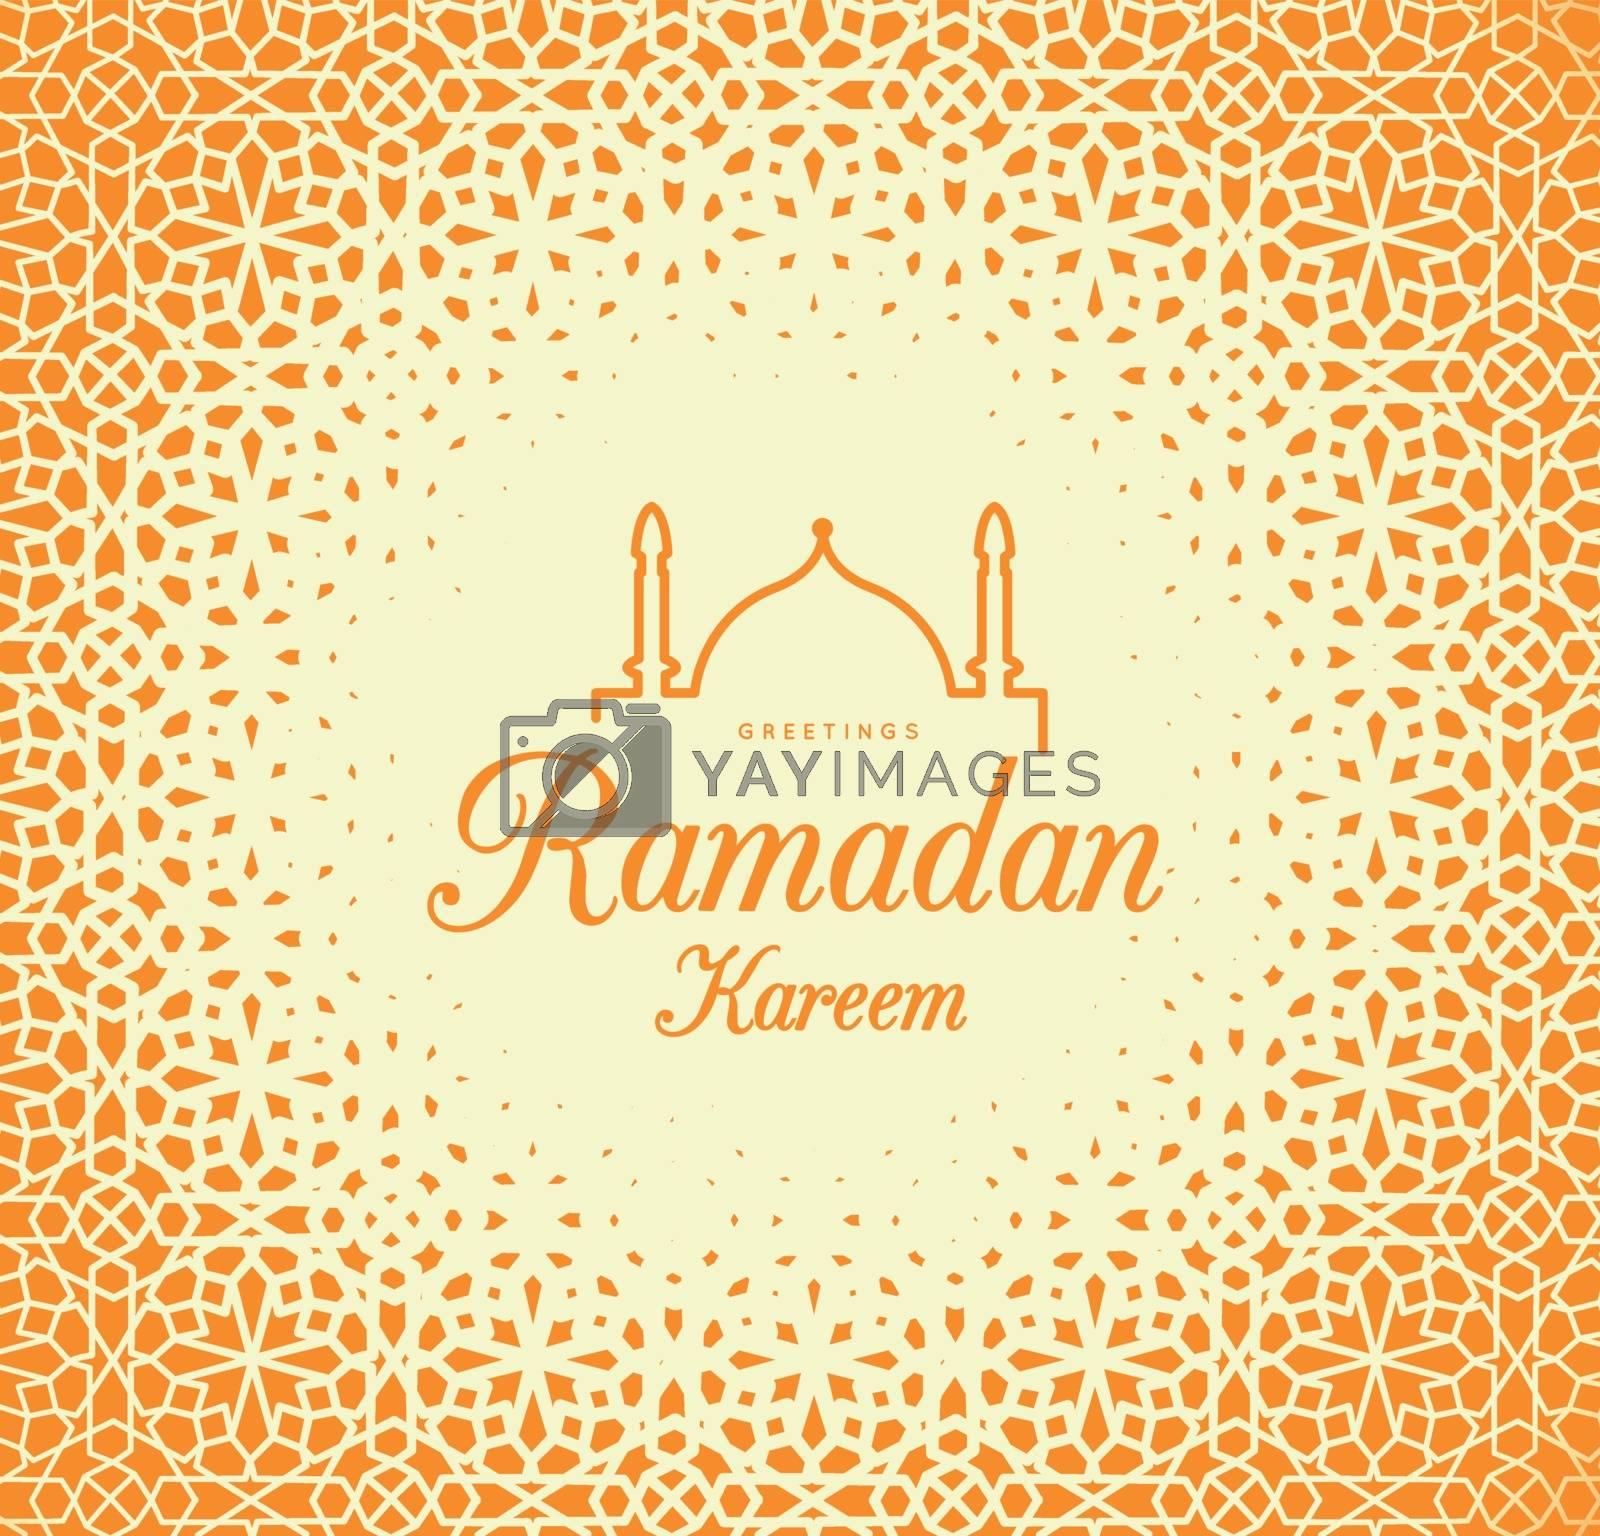 Royalty free image of Ramadan Kareem. Congratulations on the holiday. Vector by sermax55